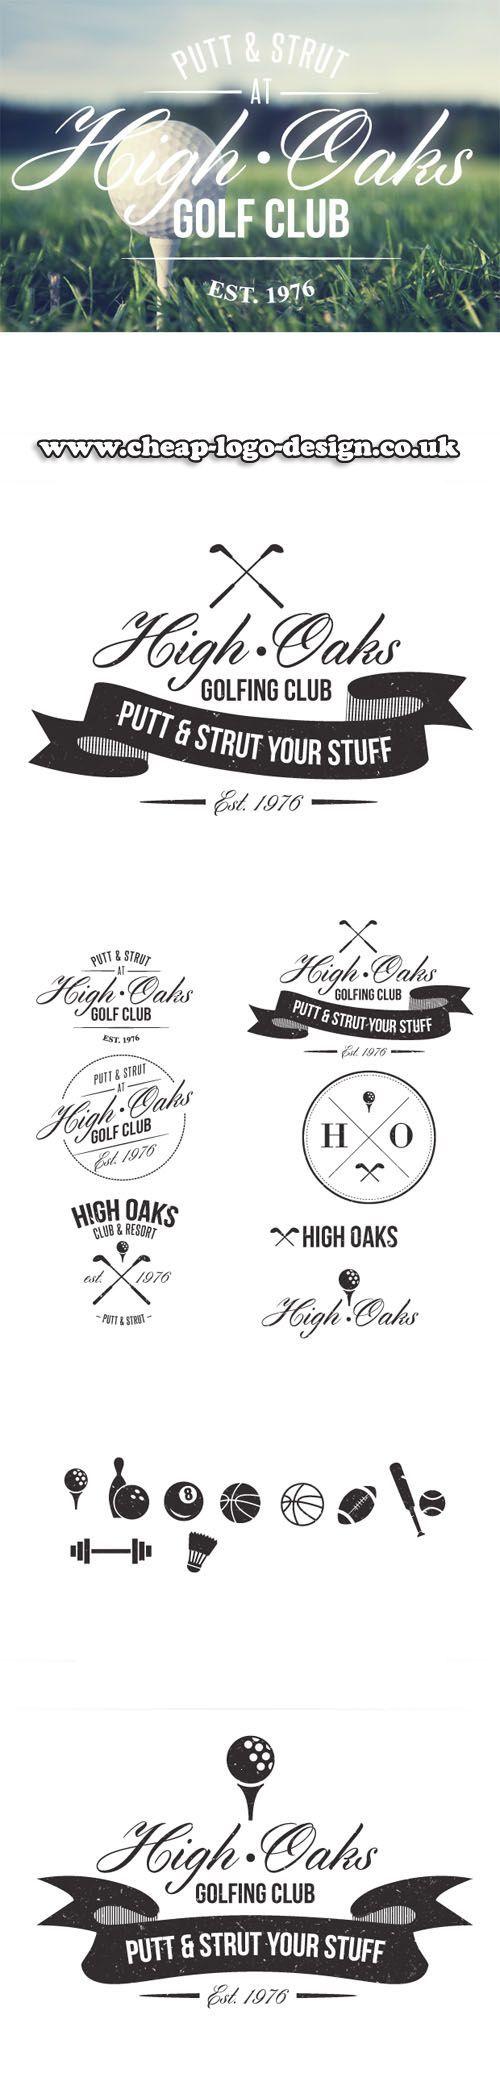 T shirt design uk cheap - Golf Club Logo Design Ideas Www Cheap Logo Design Co Uk